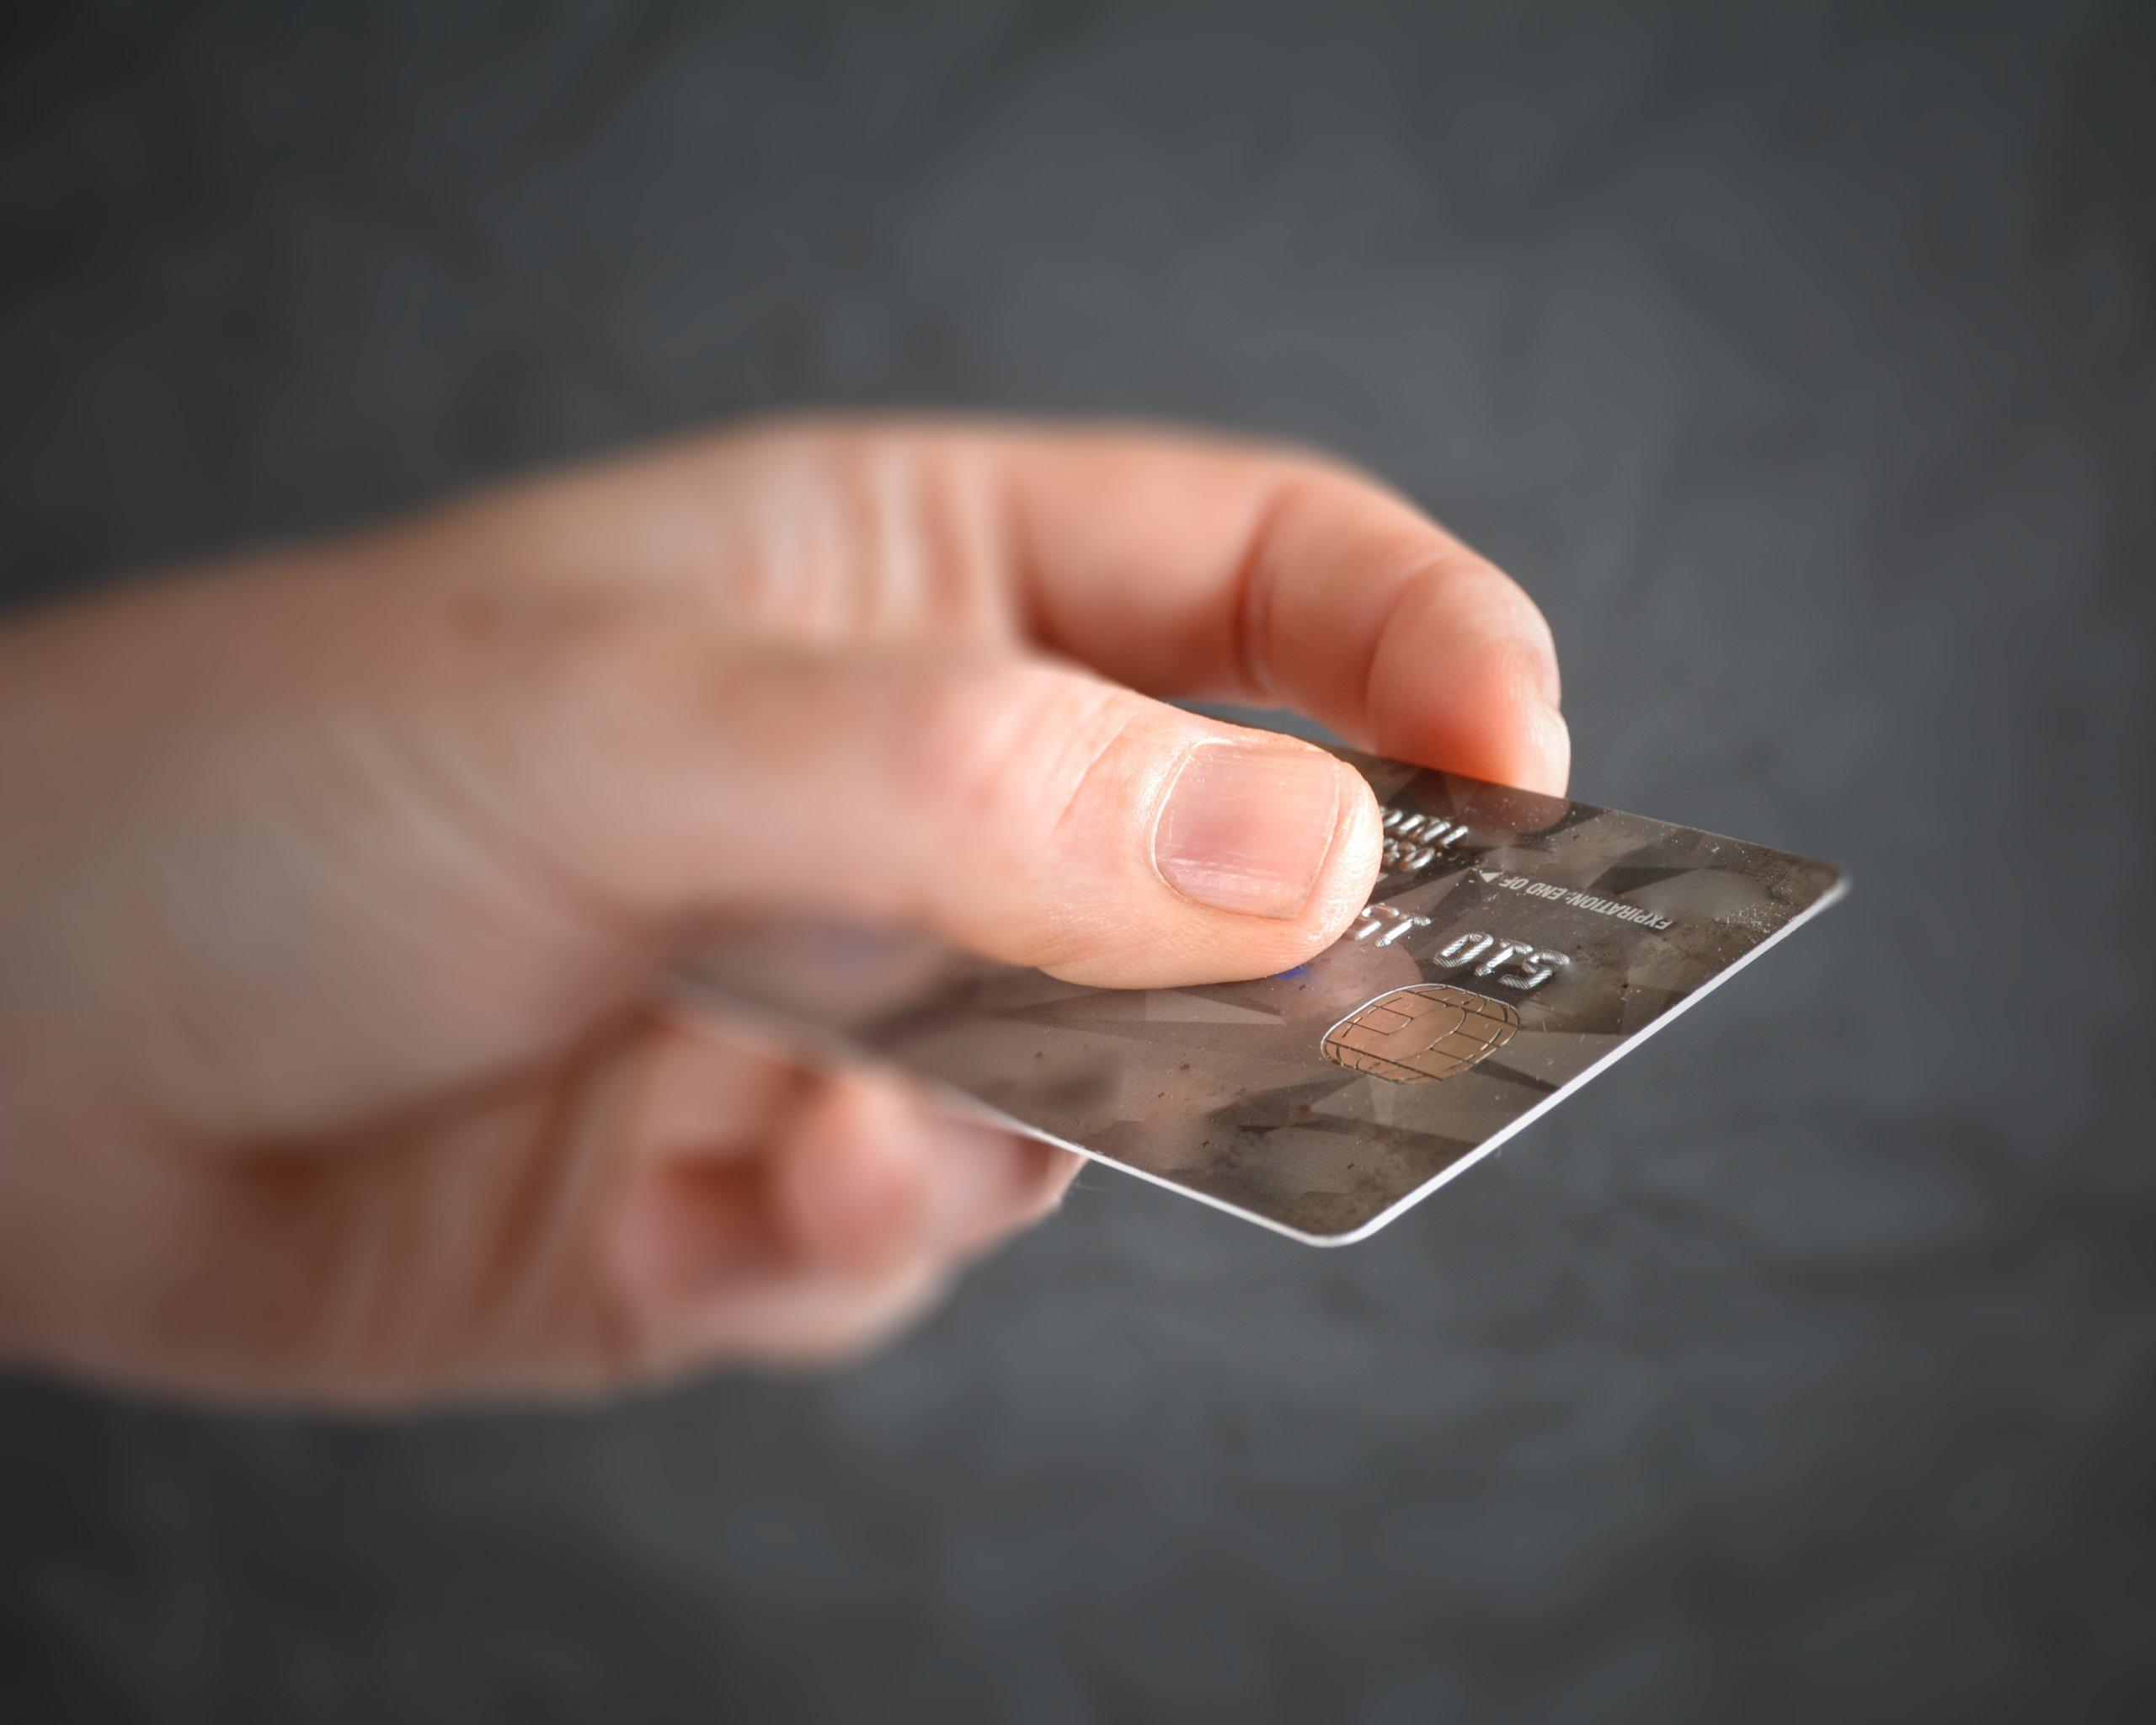 Increased citi aa credit card bonuses 50000 miles awardwallet increased citi aa credit card bonuses 50000 miles awardwallet blog magicingreecefo Choice Image